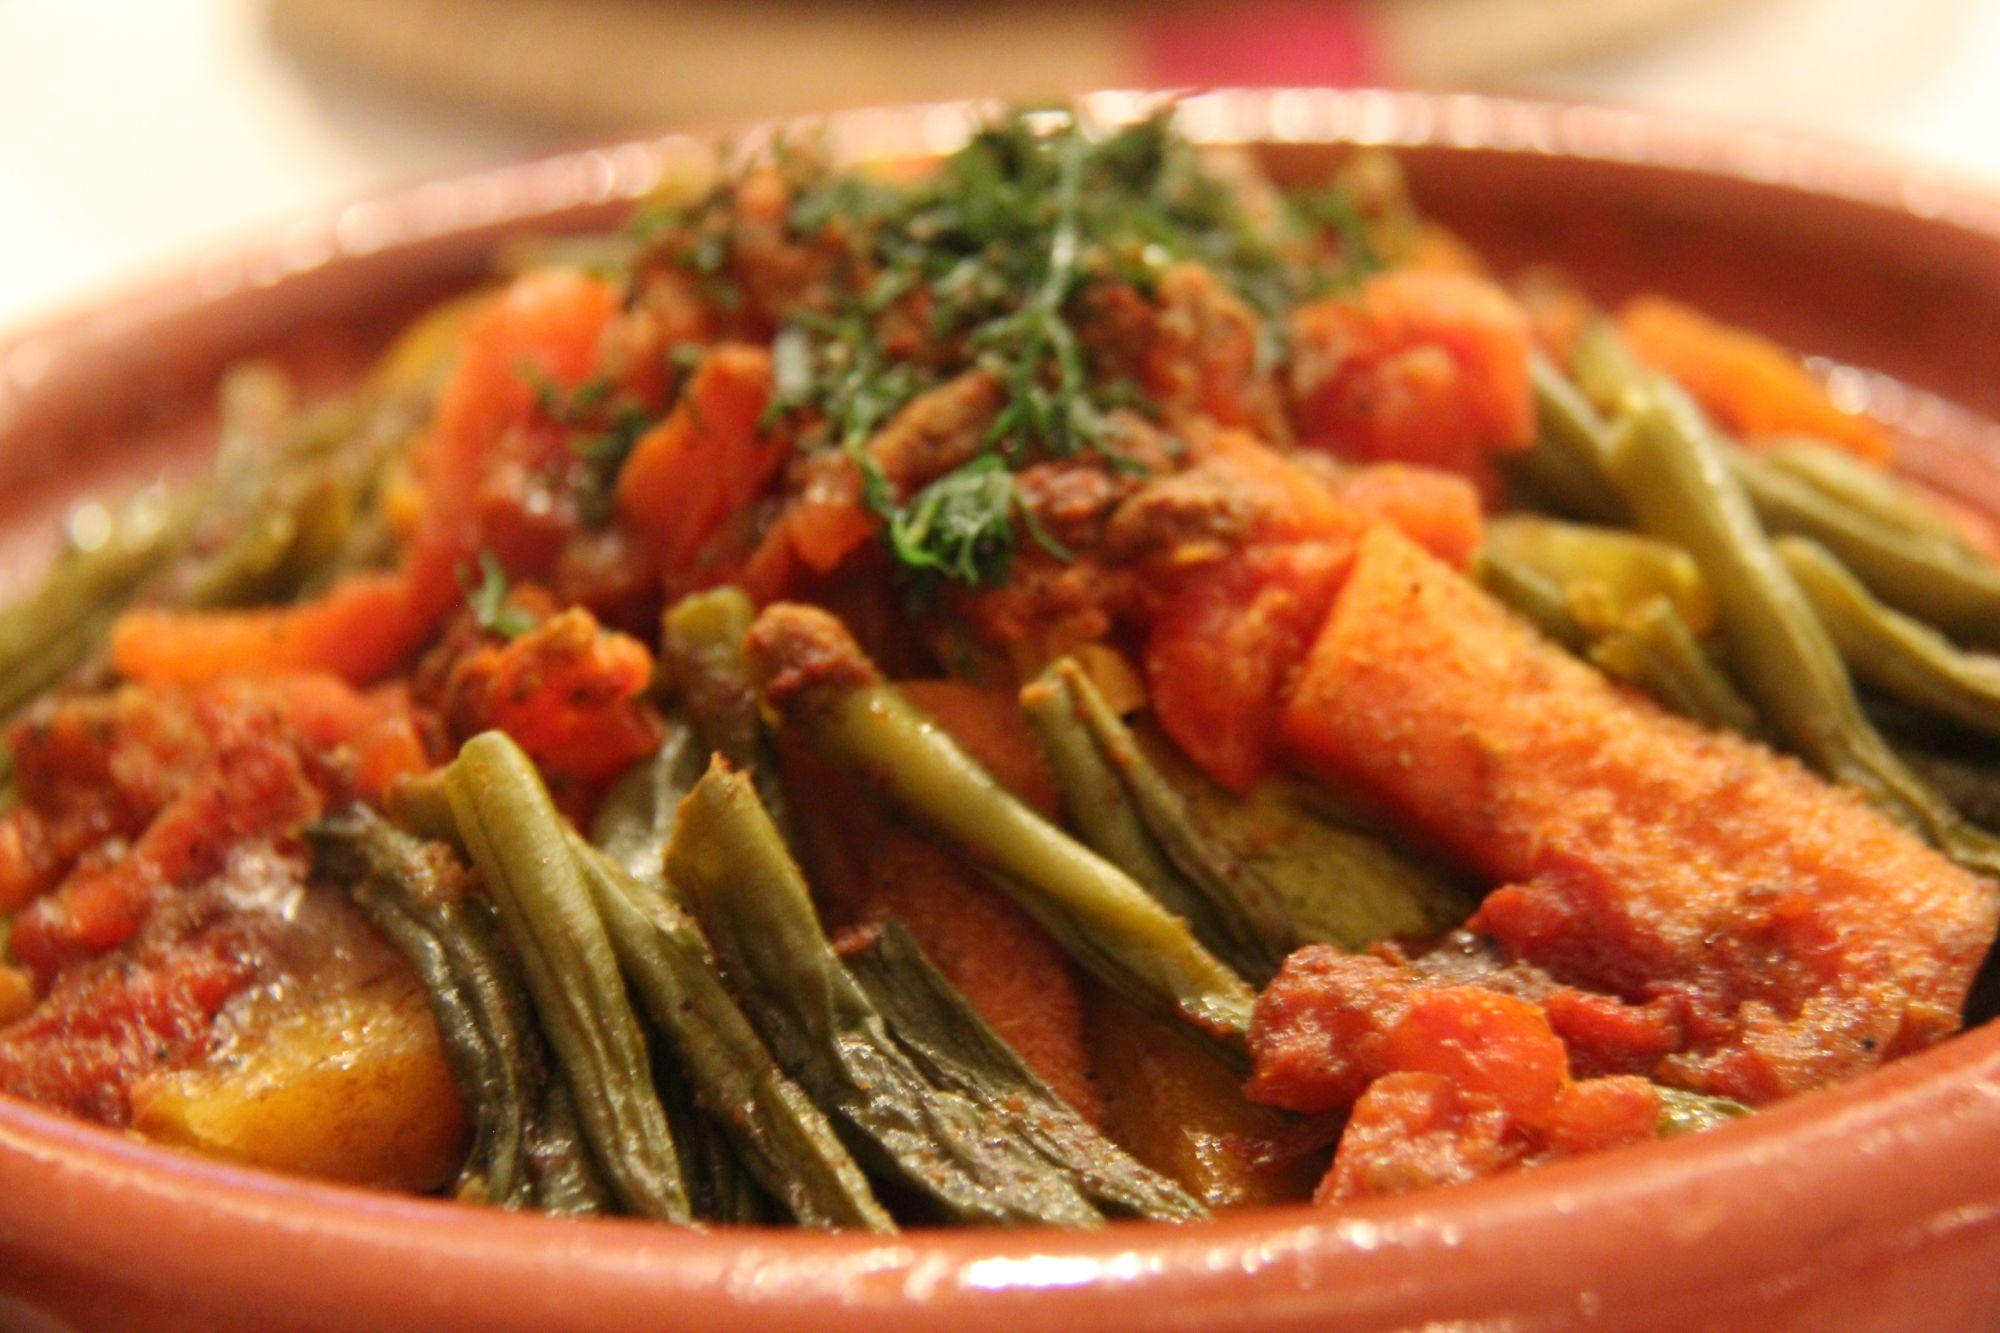 Tagine dinner at Riad Star